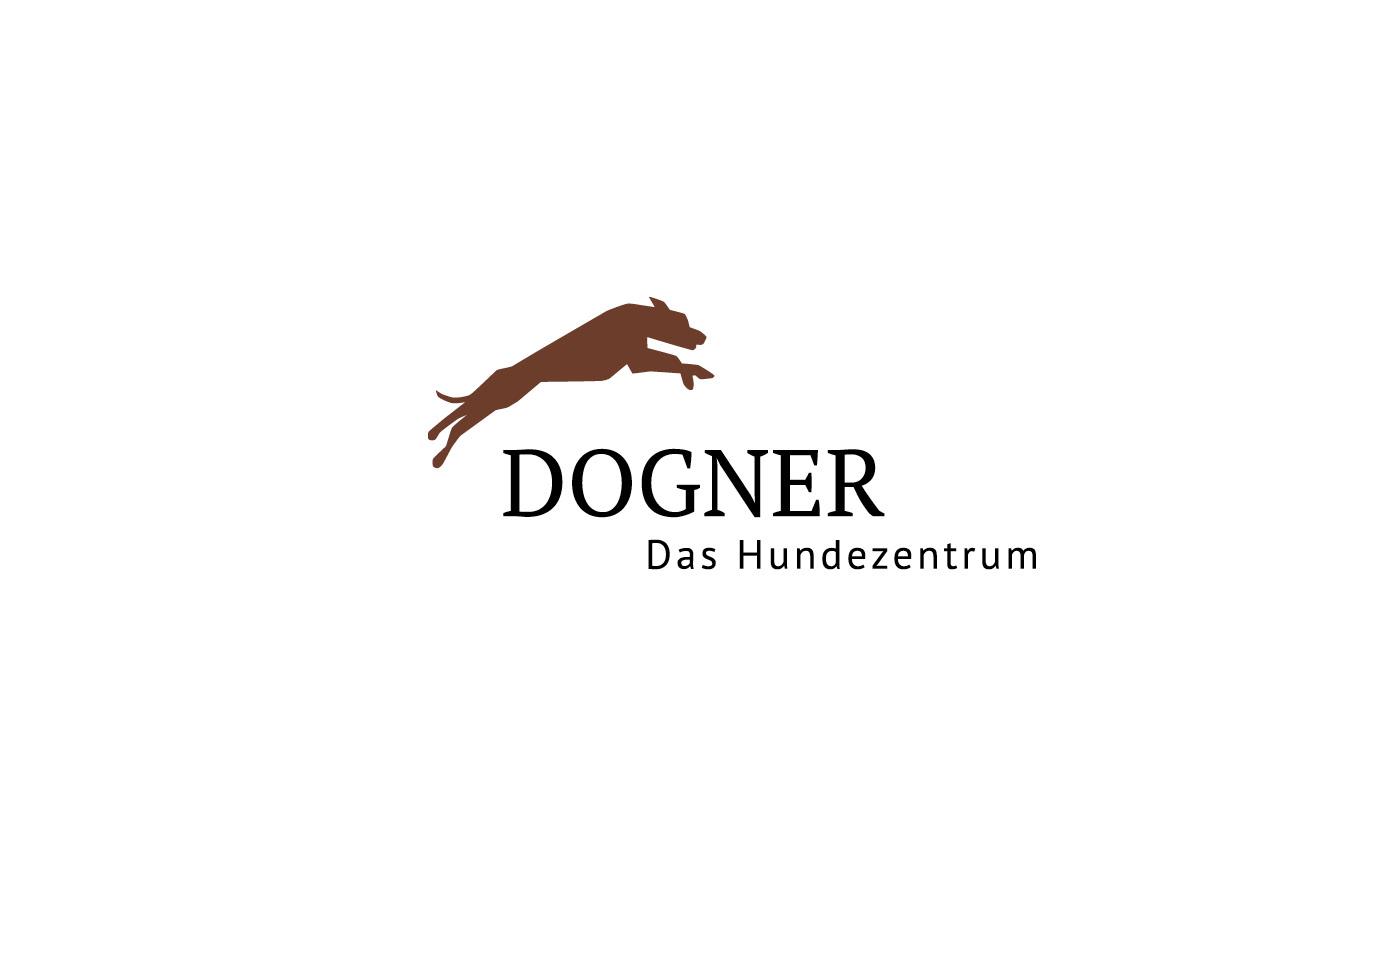 Dogner – das Hundezentrum